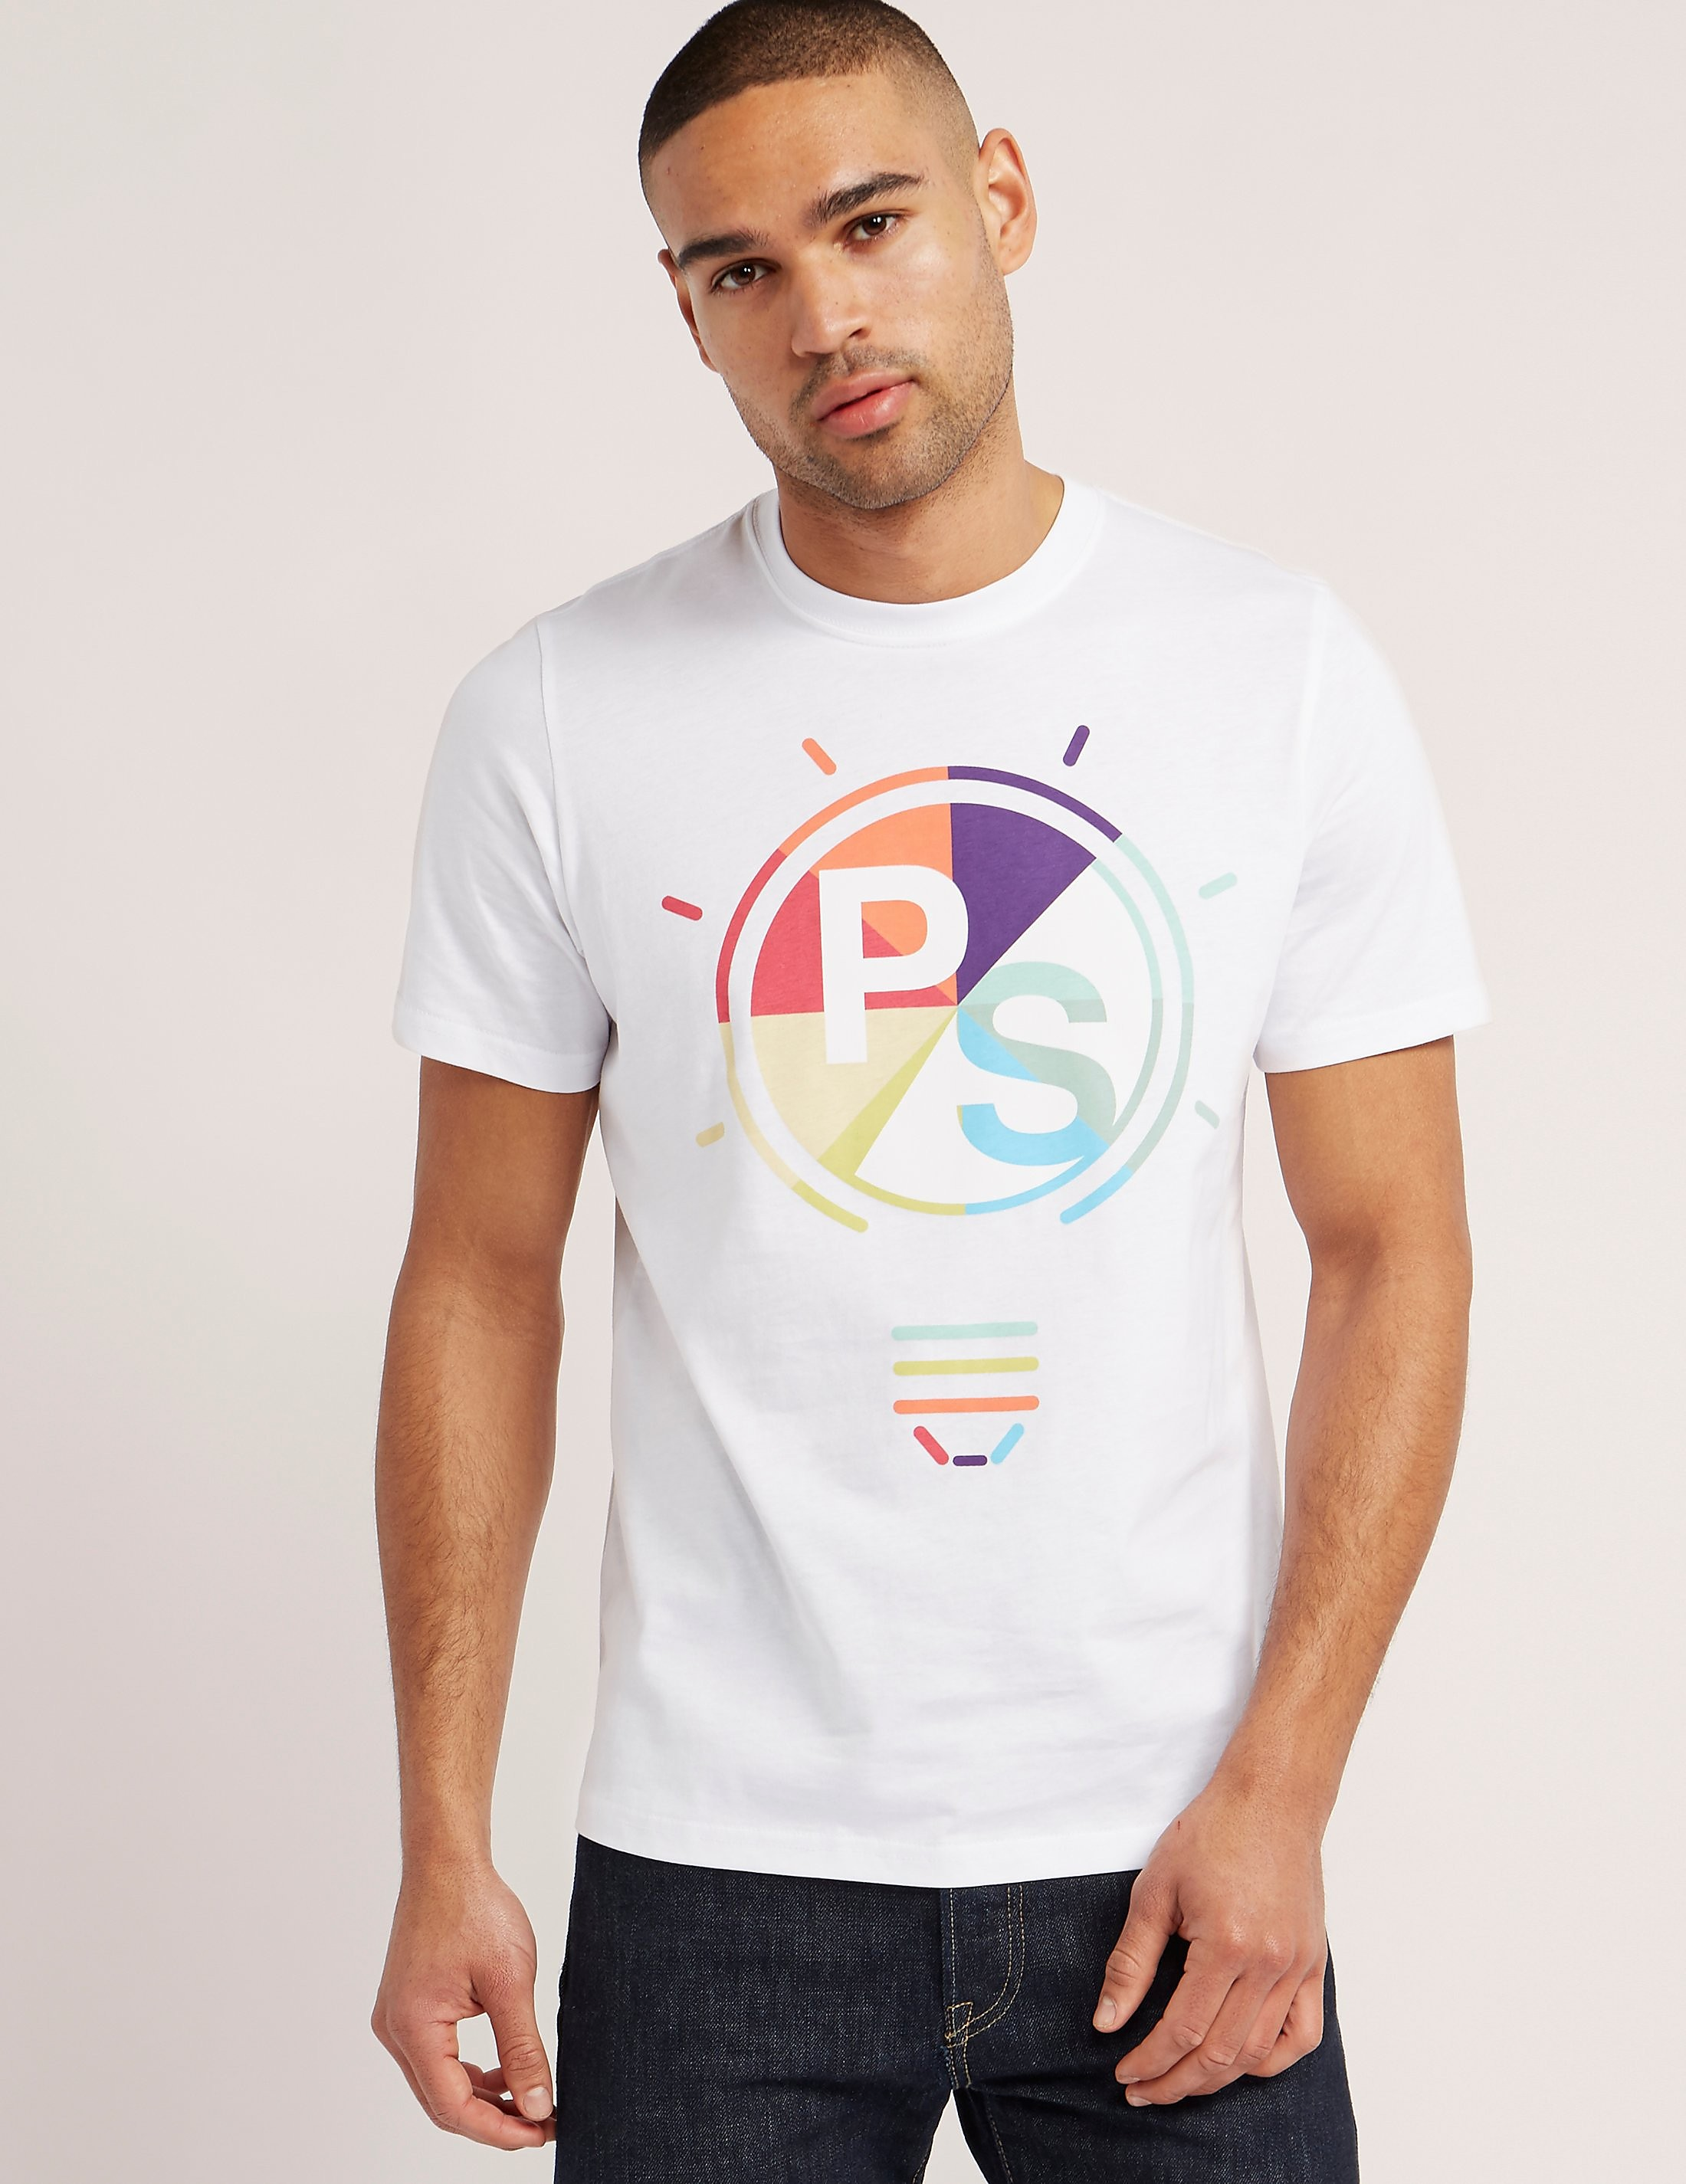 Paul Smith Lightbulb T-Shirt